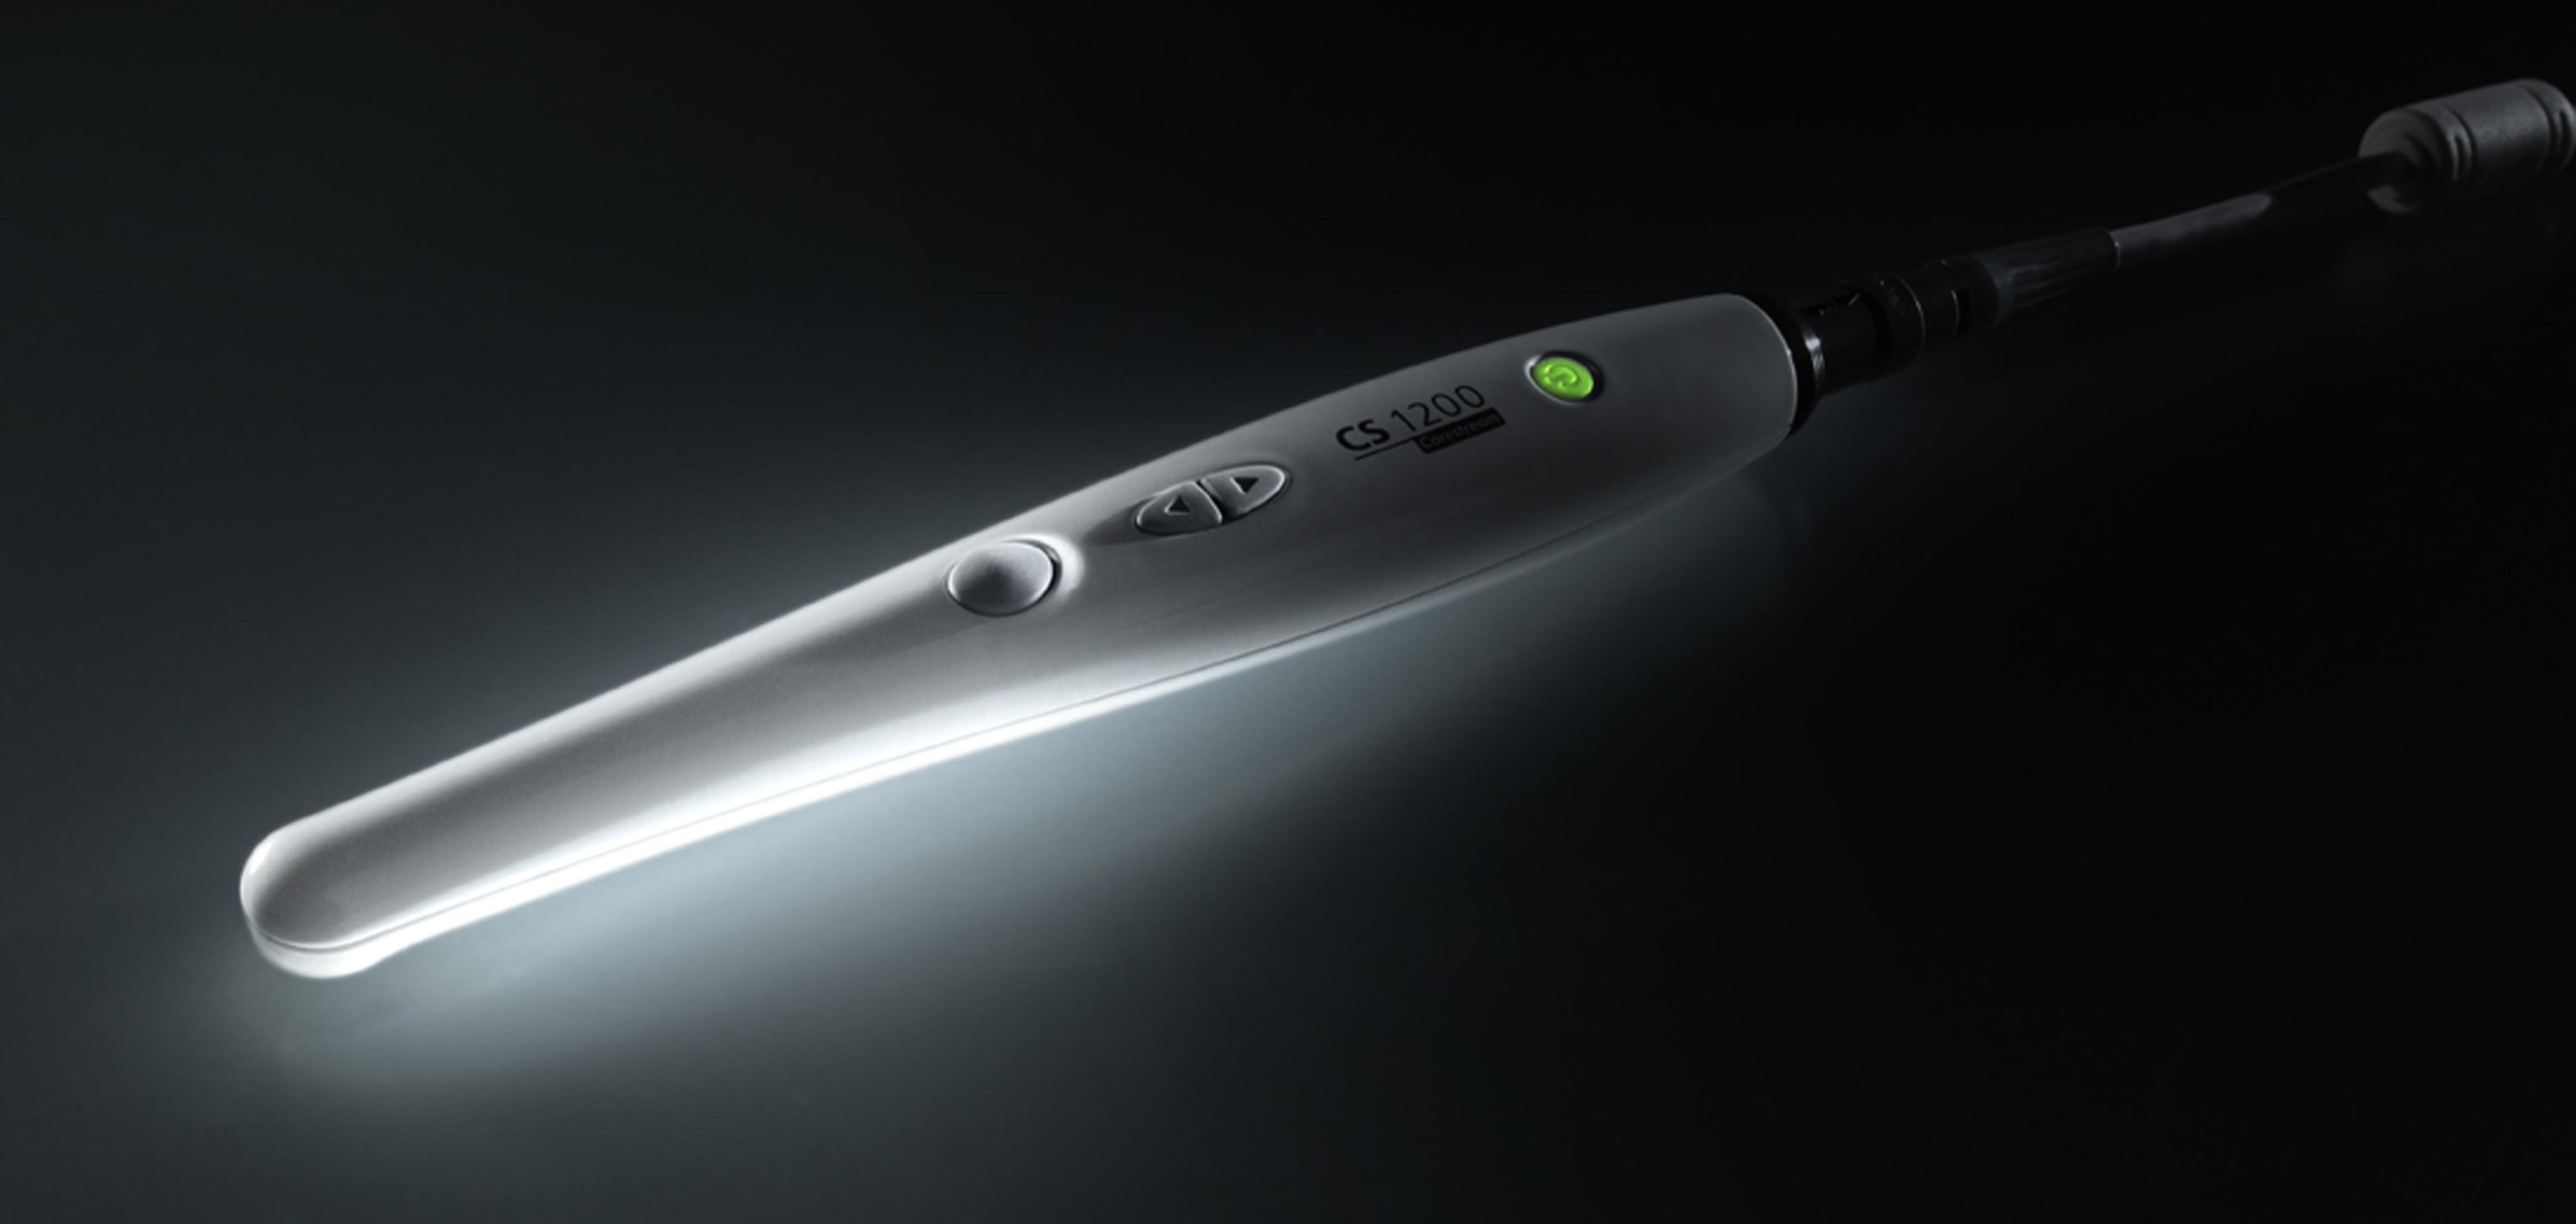 DenTec anbefaler CS 1200 fra Carestream. Intraoralt kamera